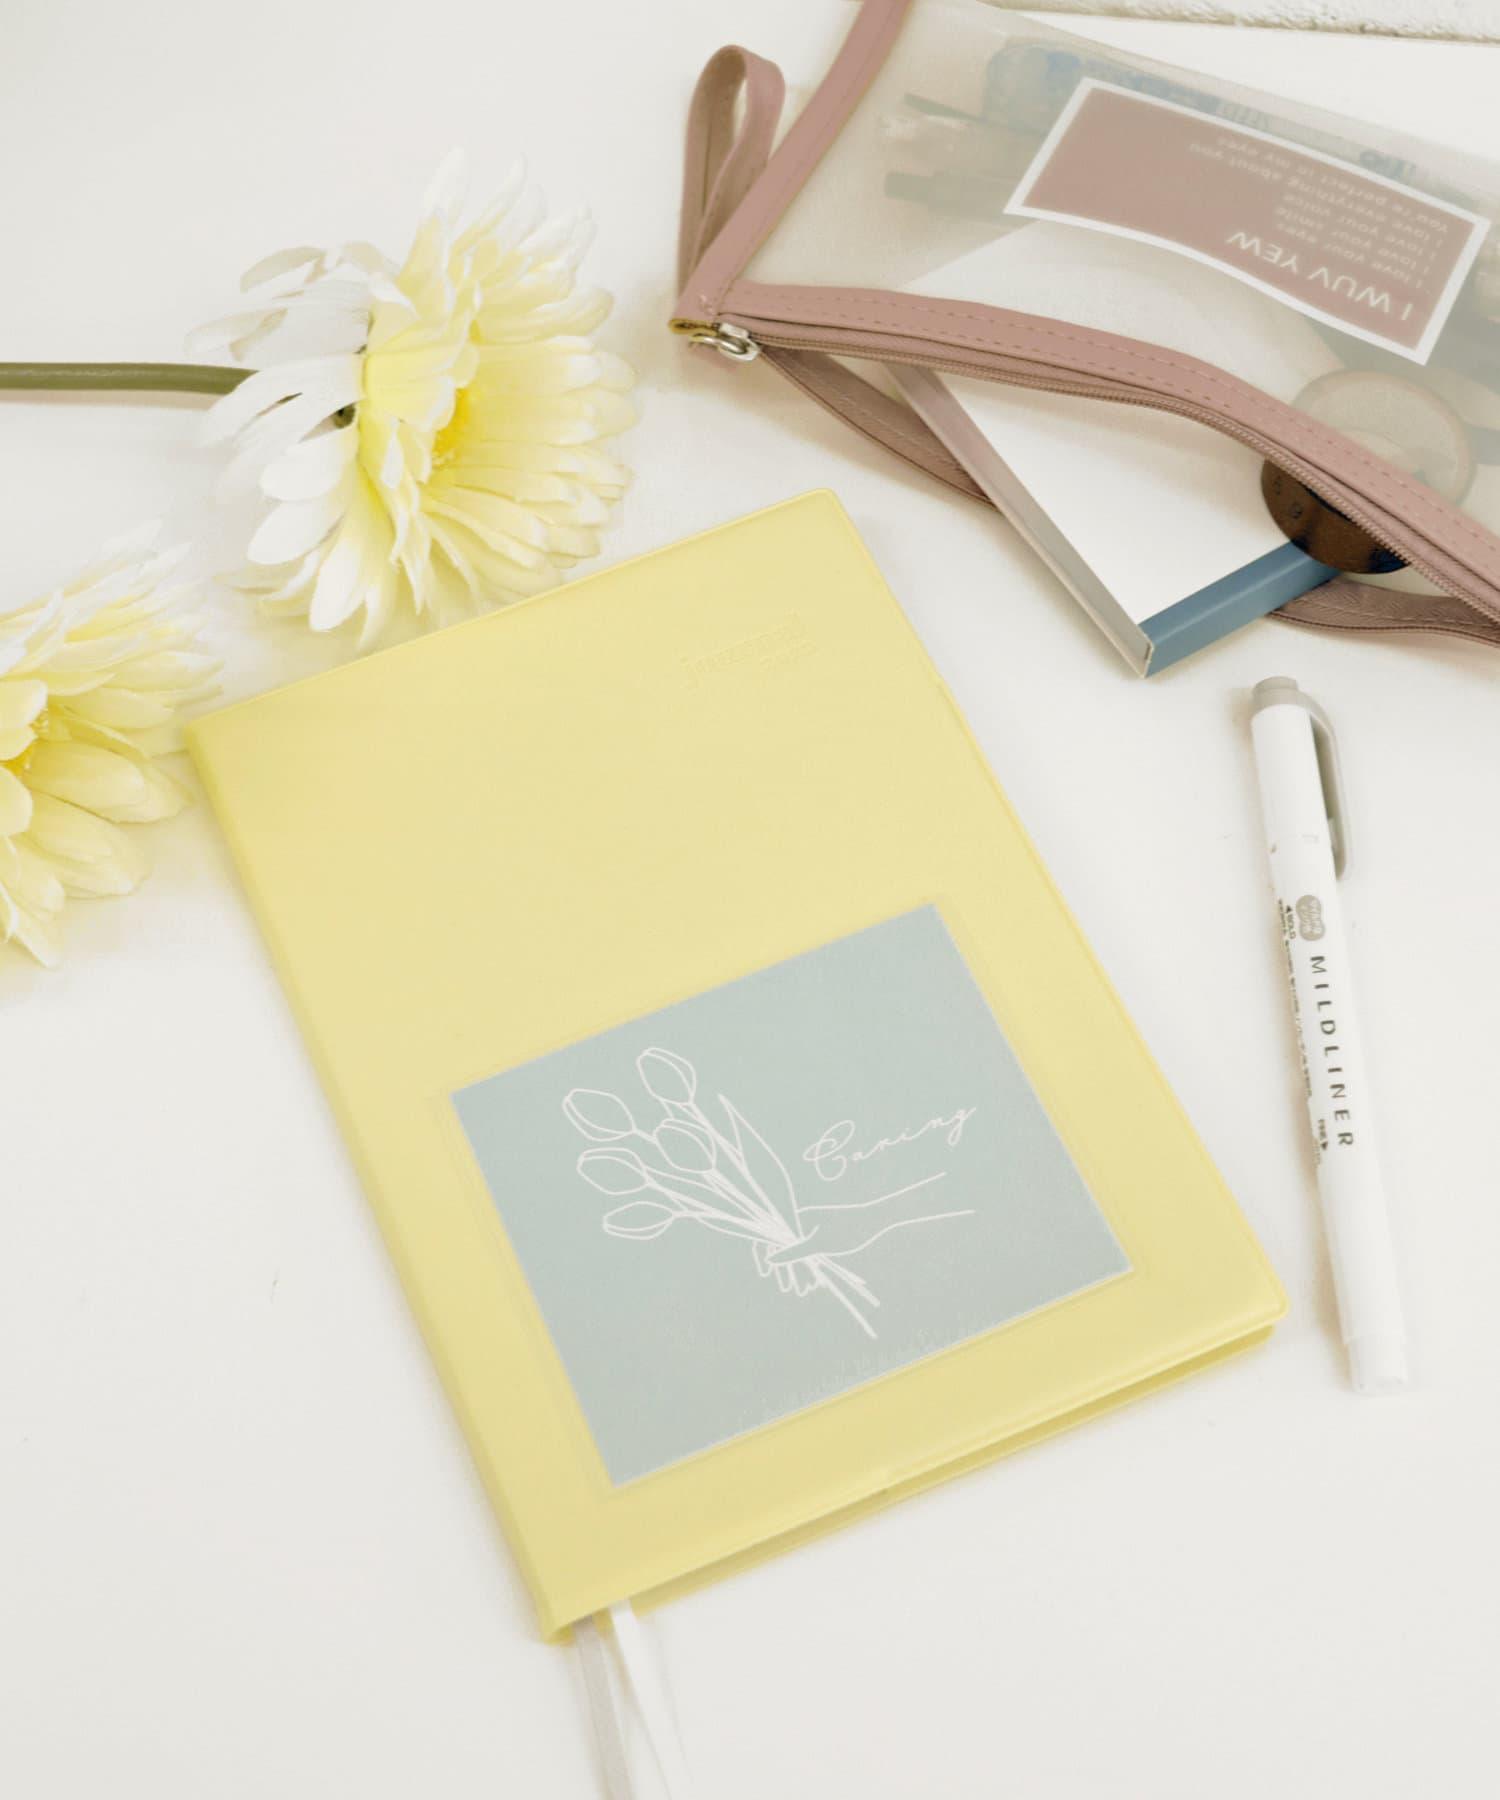 3COINS(スリーコインズ) ライフスタイル 【MY SCHEDULE】 B6サイズポケット付き手帳 イエロー